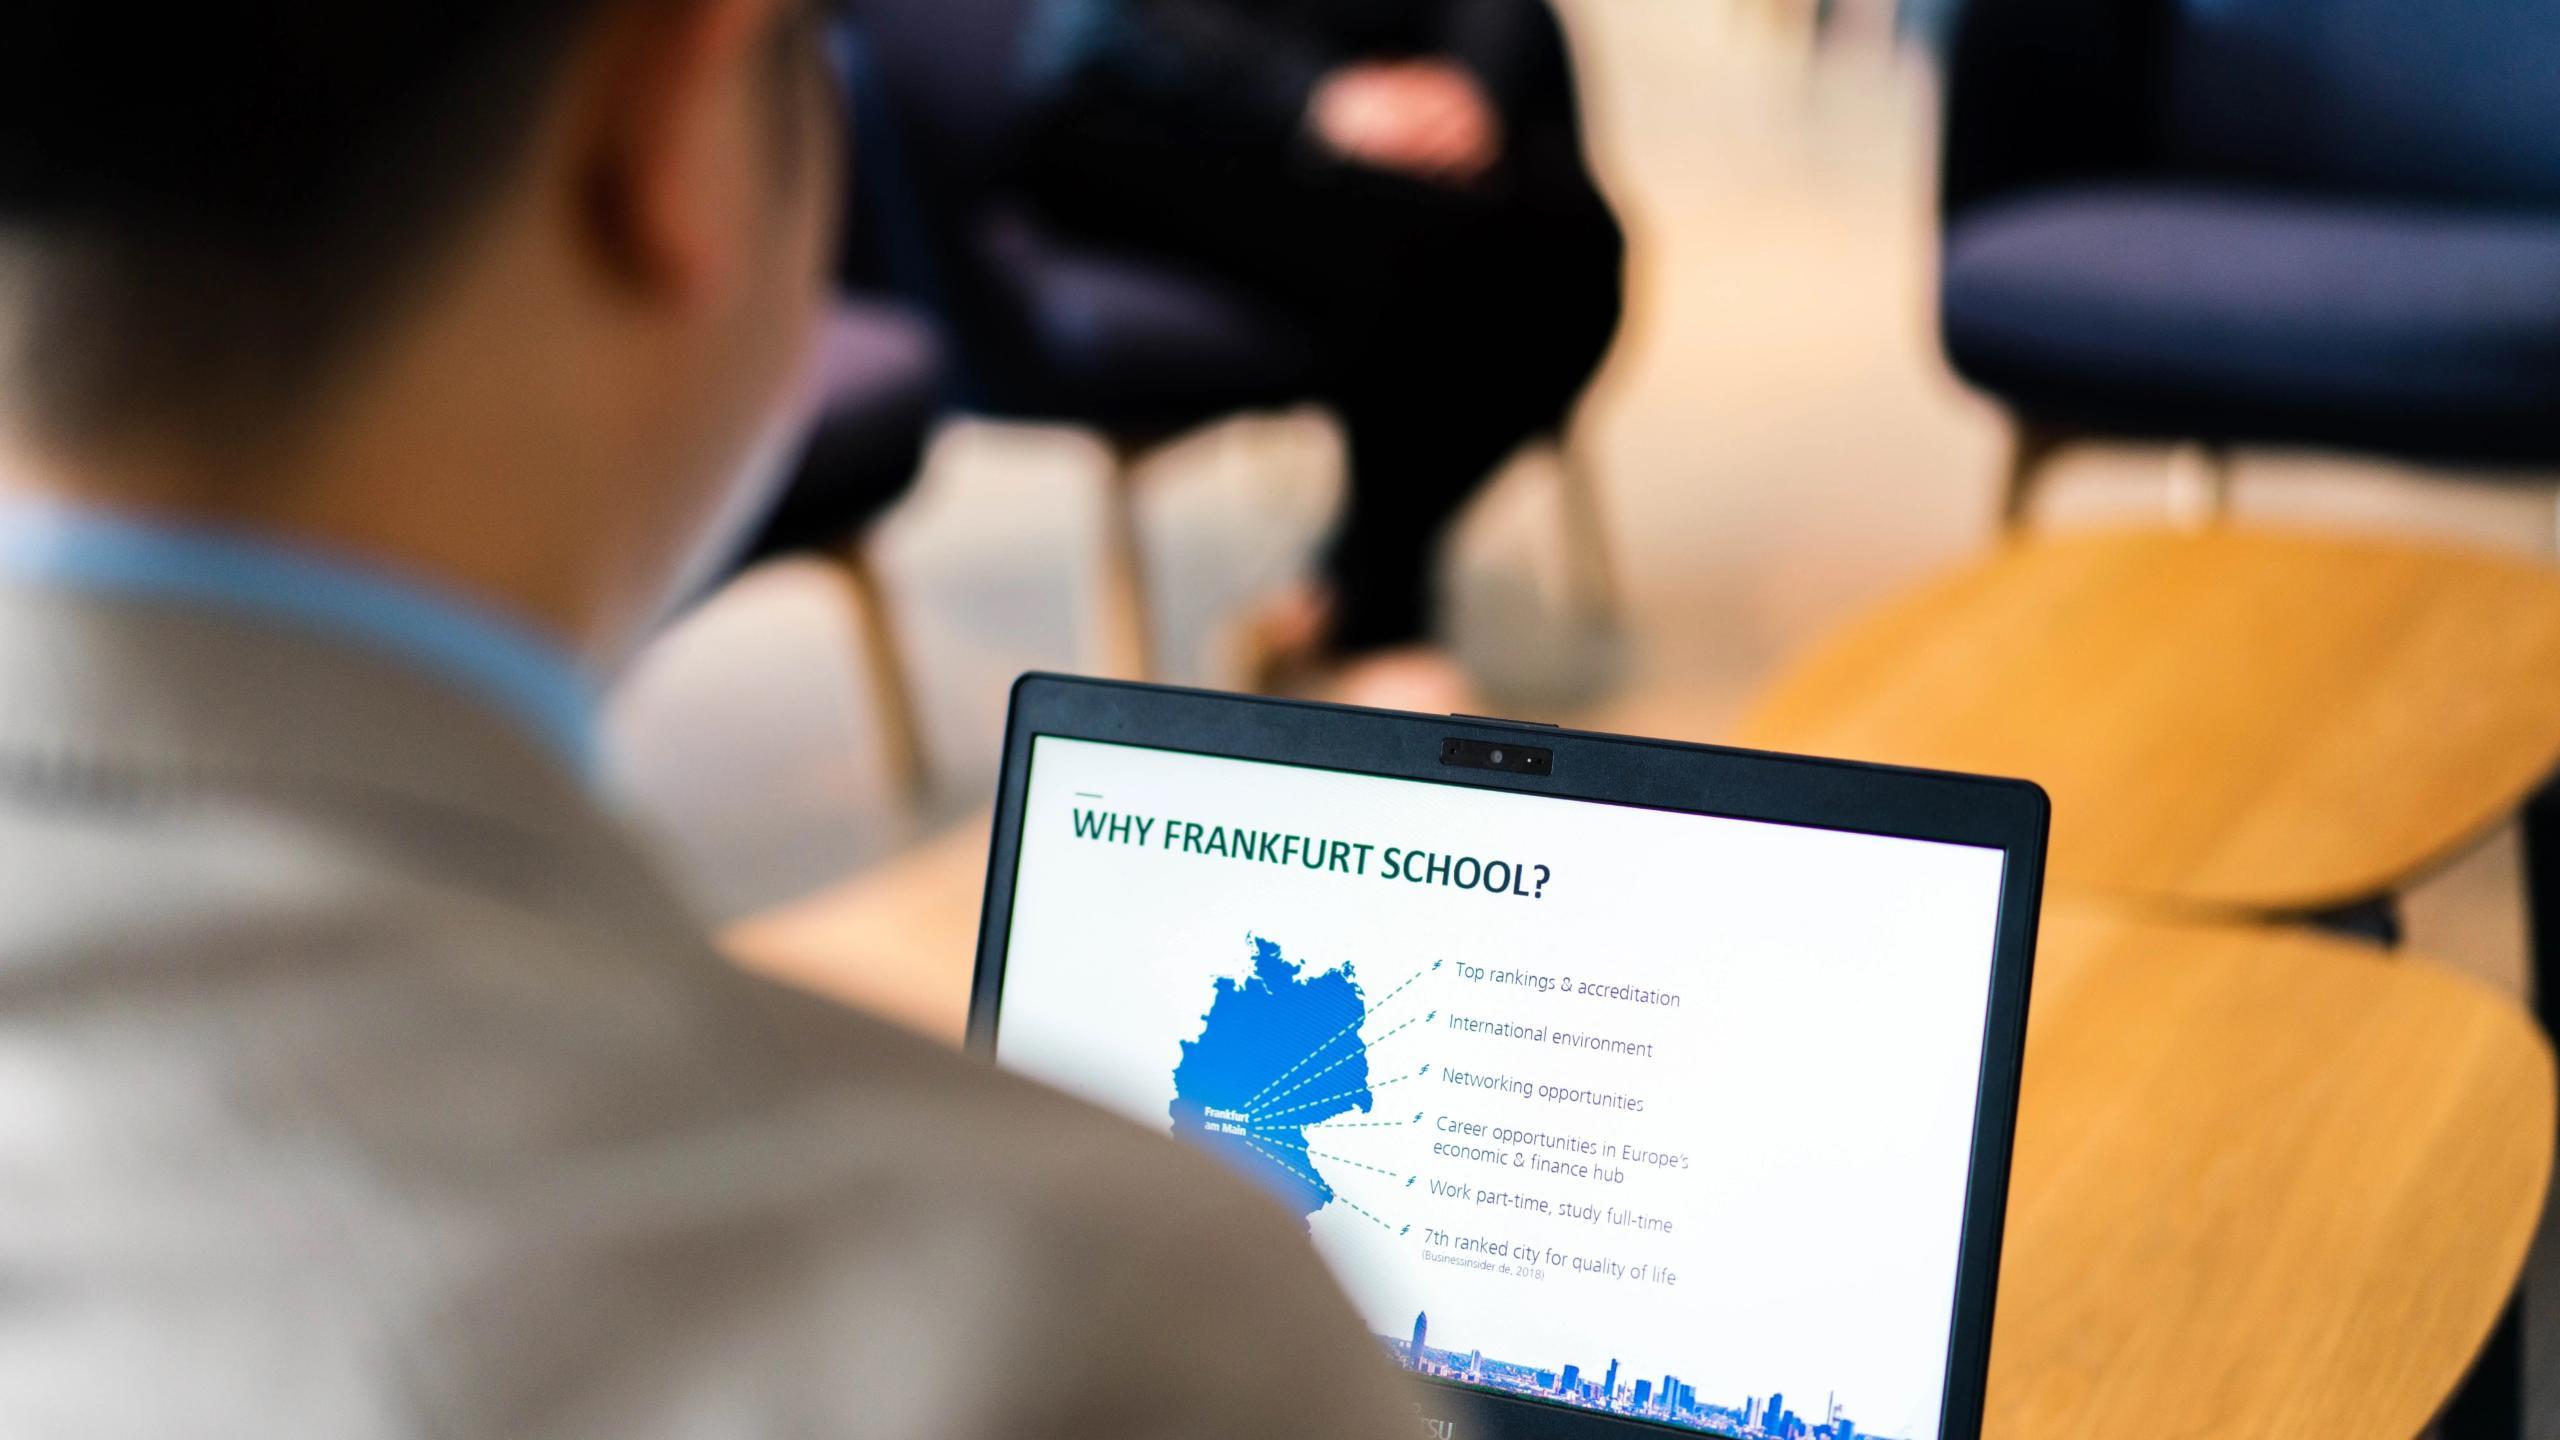 Sascha Walsdorf-Knaus, Full-time MBA Class of 2021